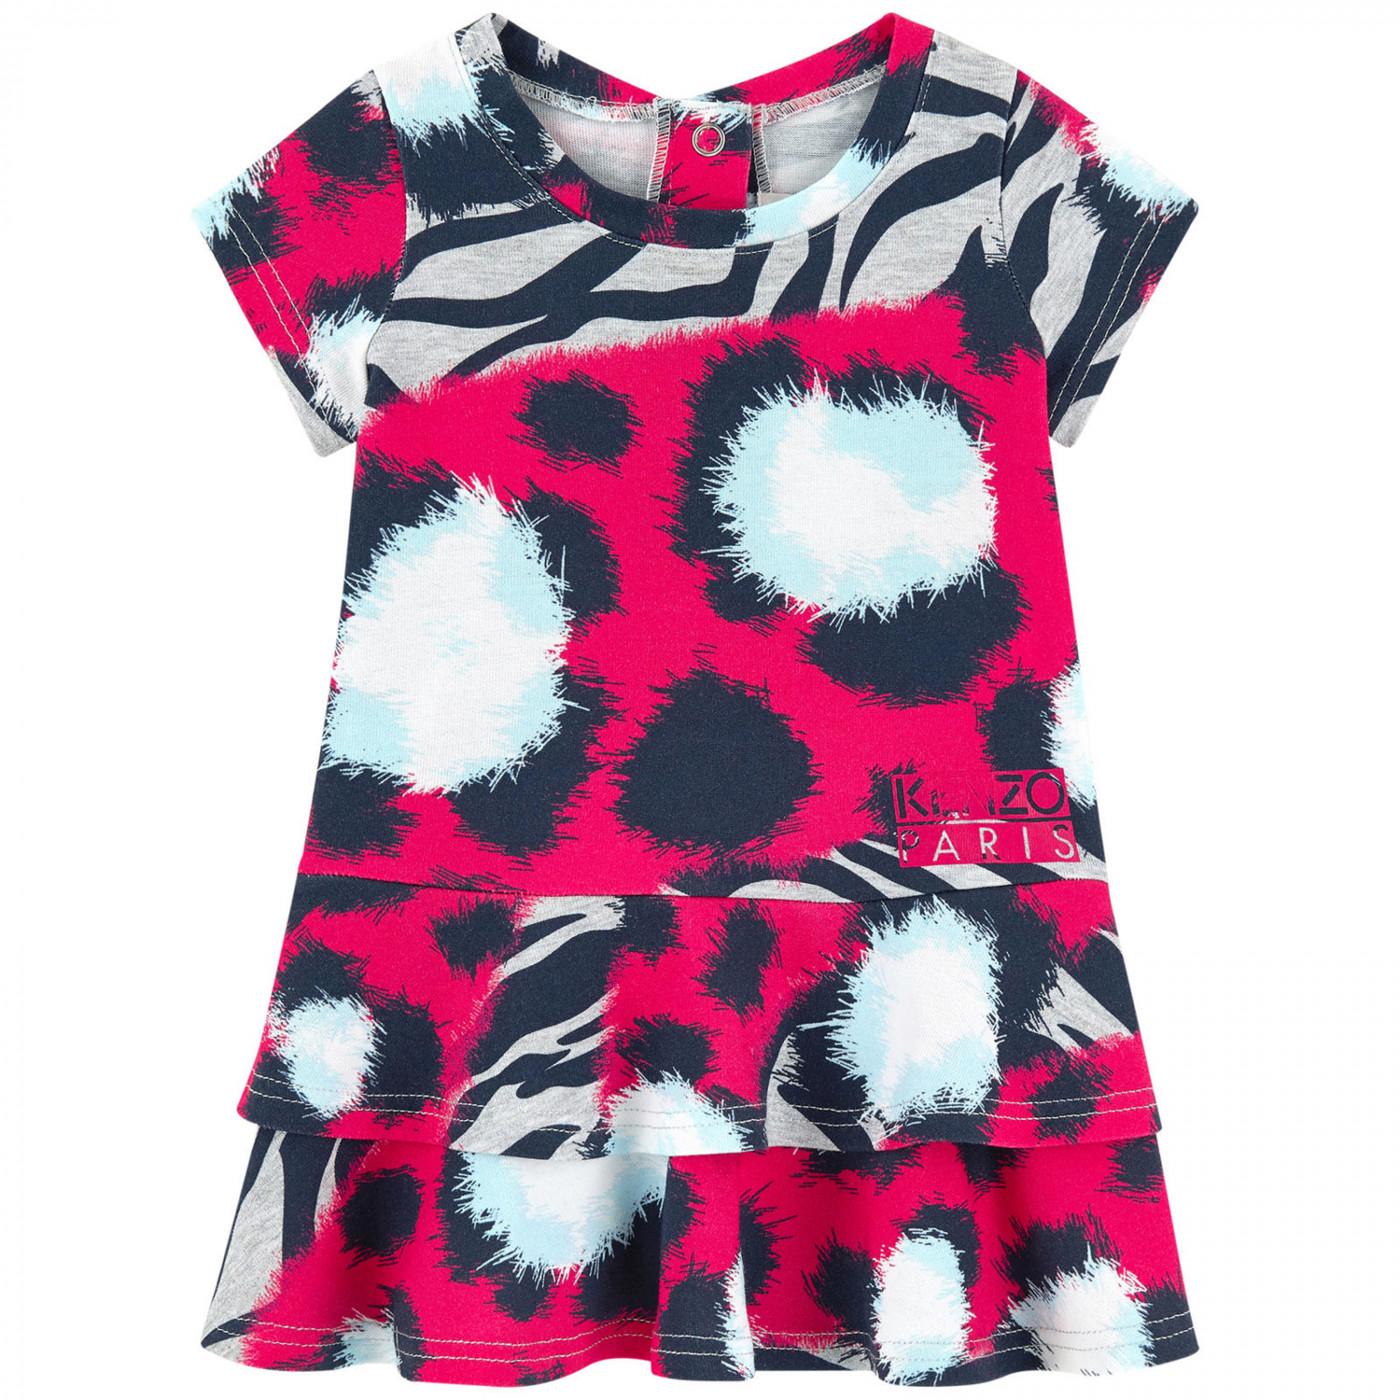 Платье Kenzo KL30107-35